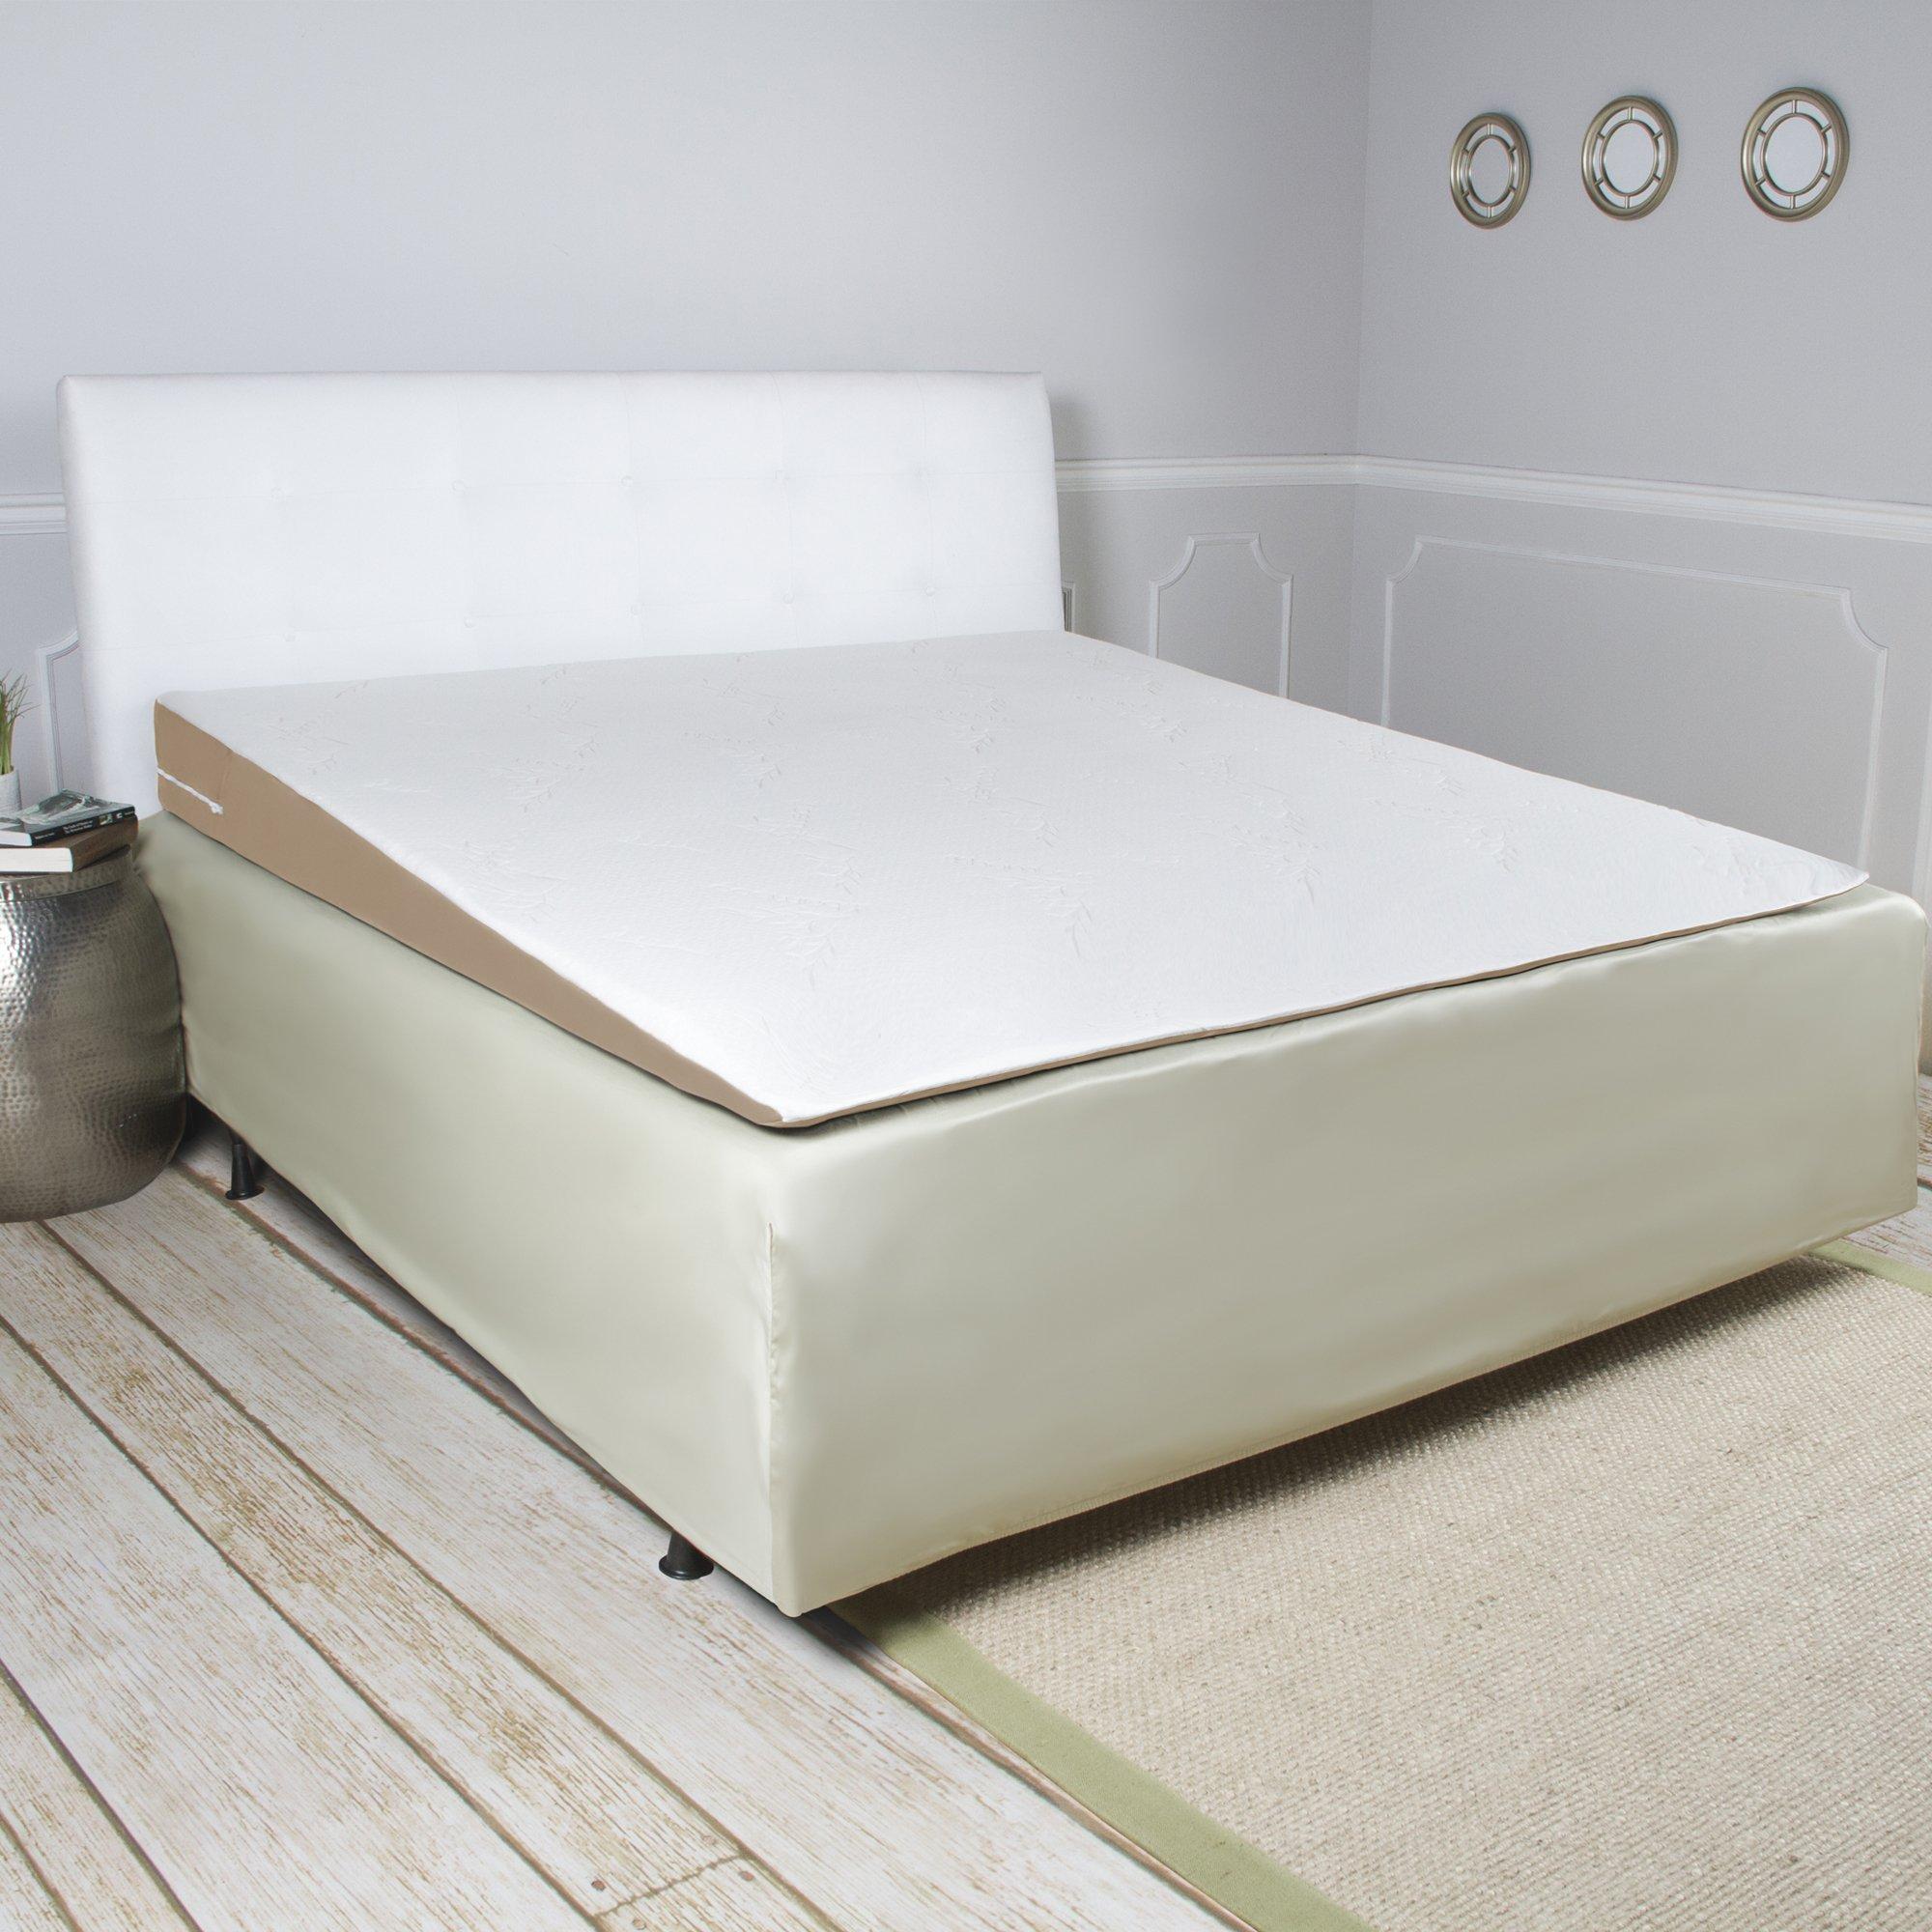 Avana Inclined Memory Foam Mattress Topper Wedge, Queen-Size Bed